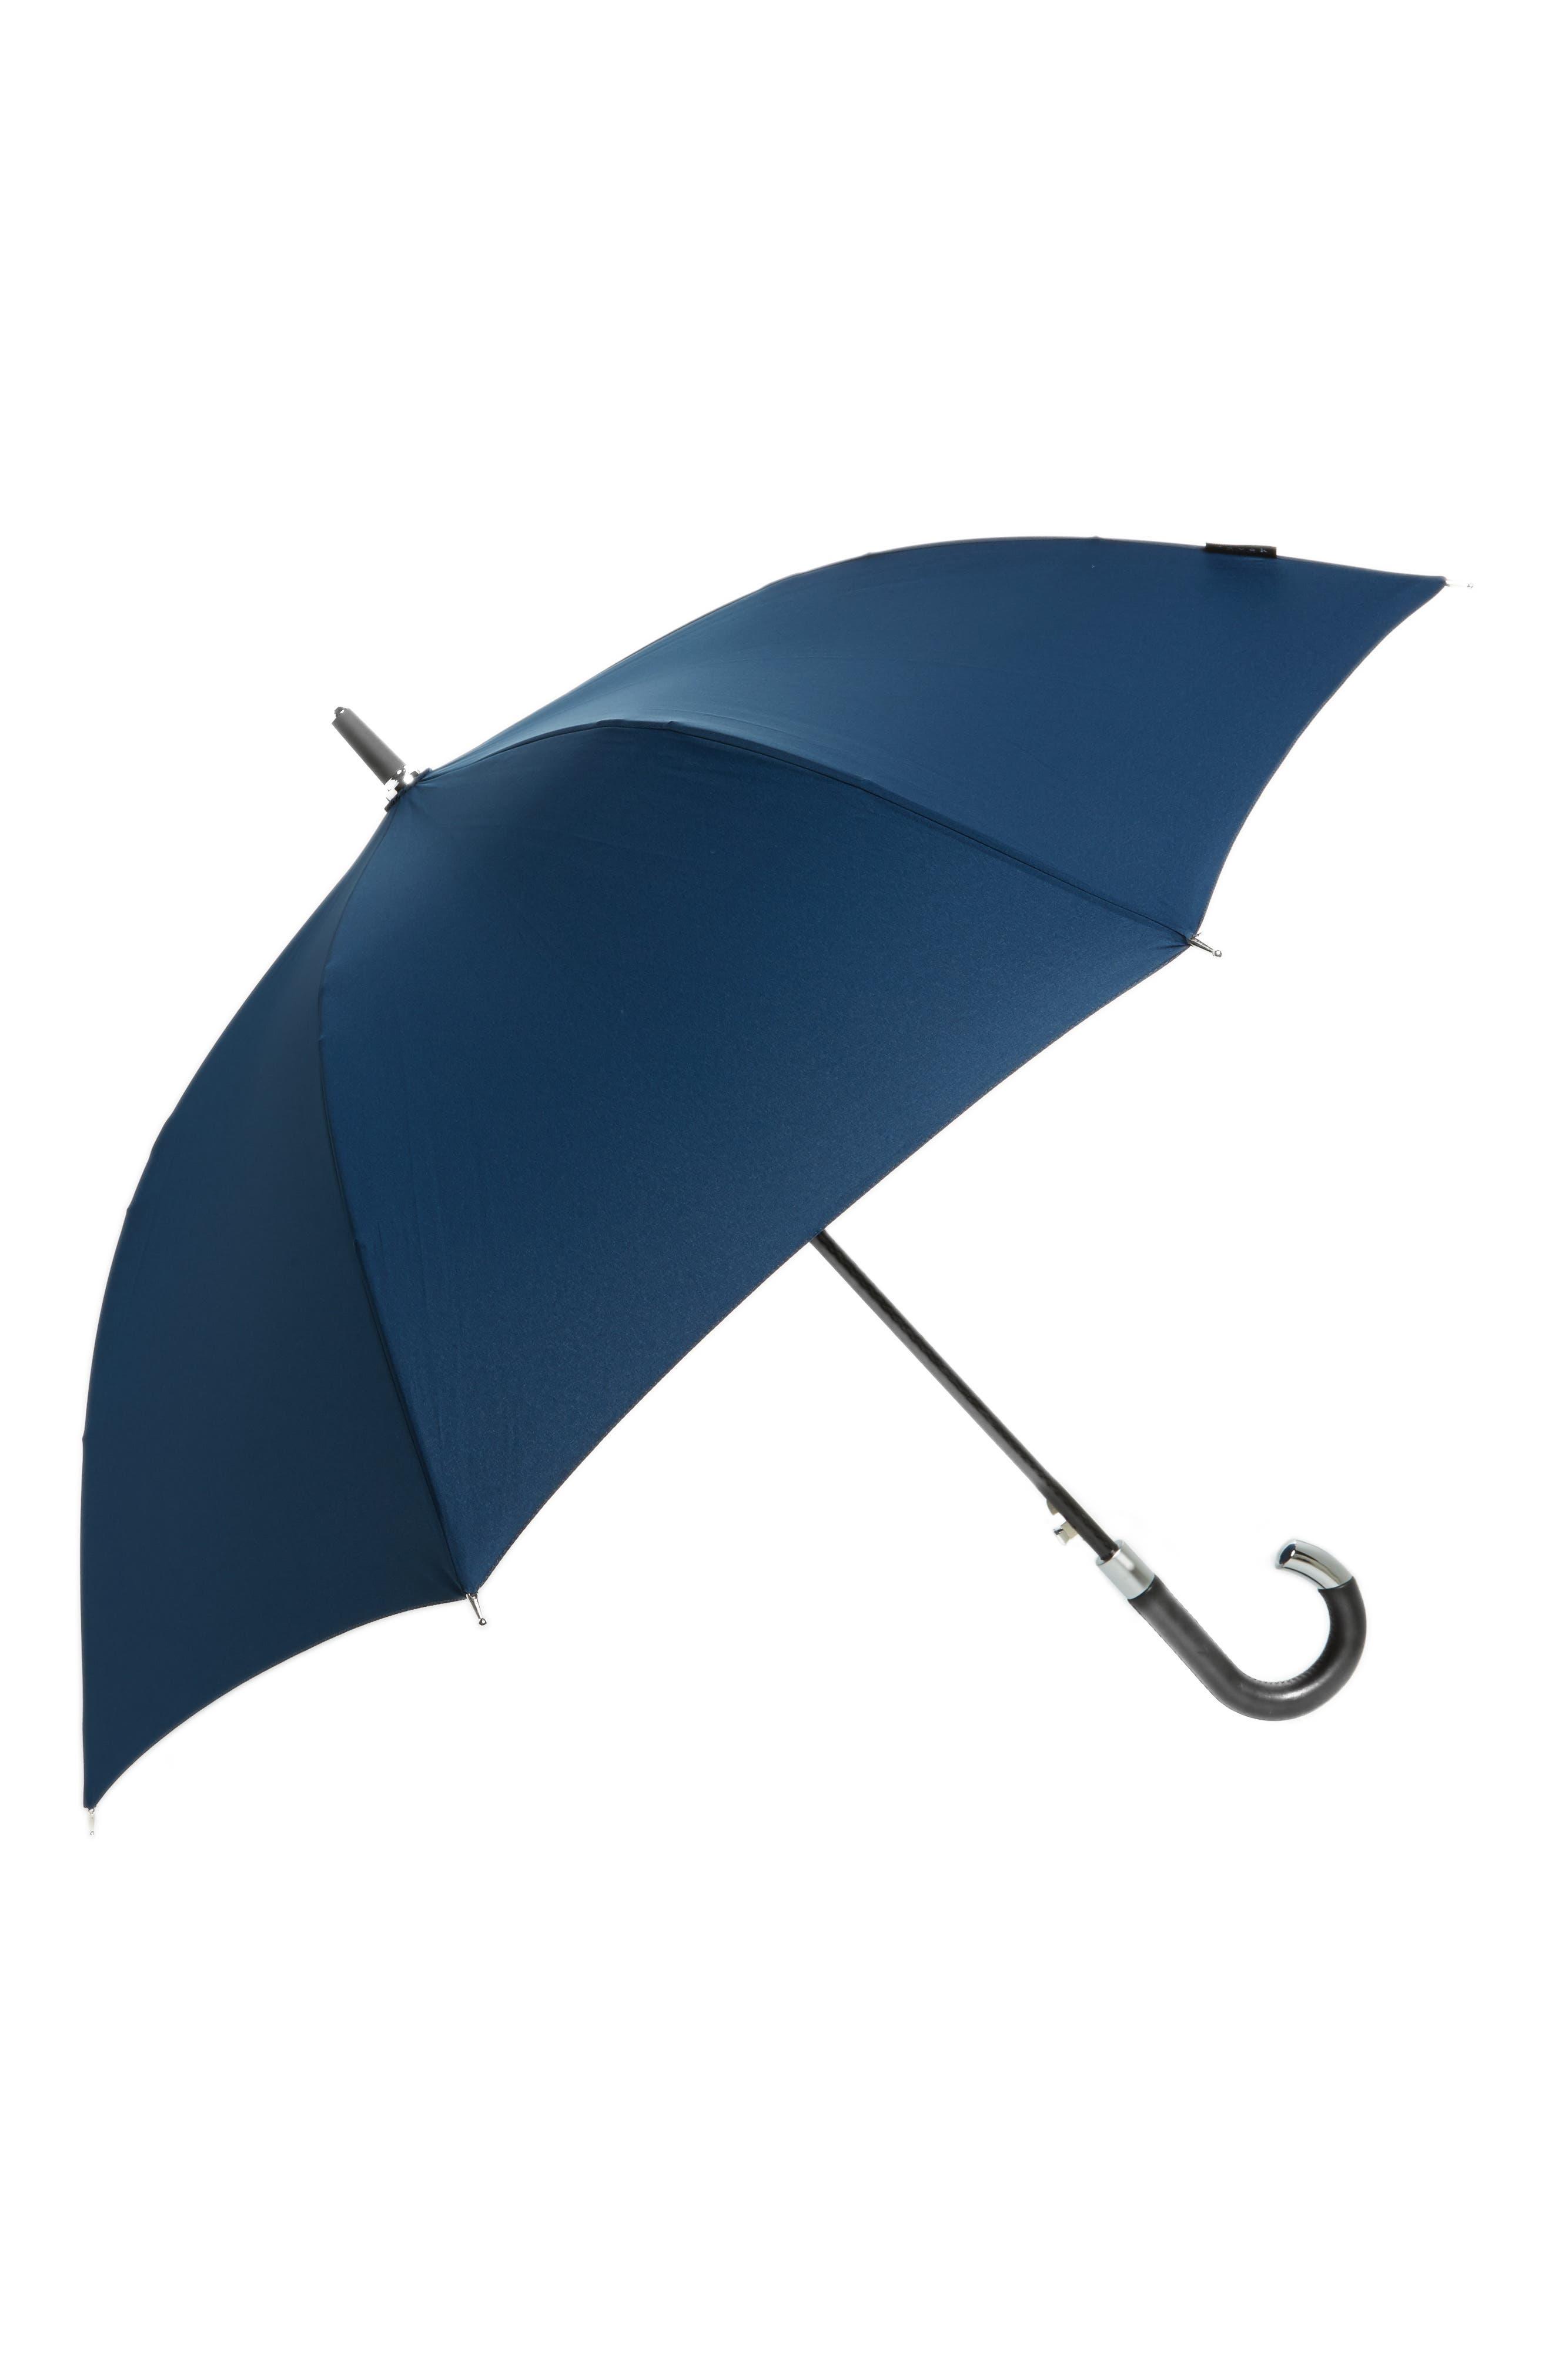 Main Image - DAVEK Elite Cane Umbrella